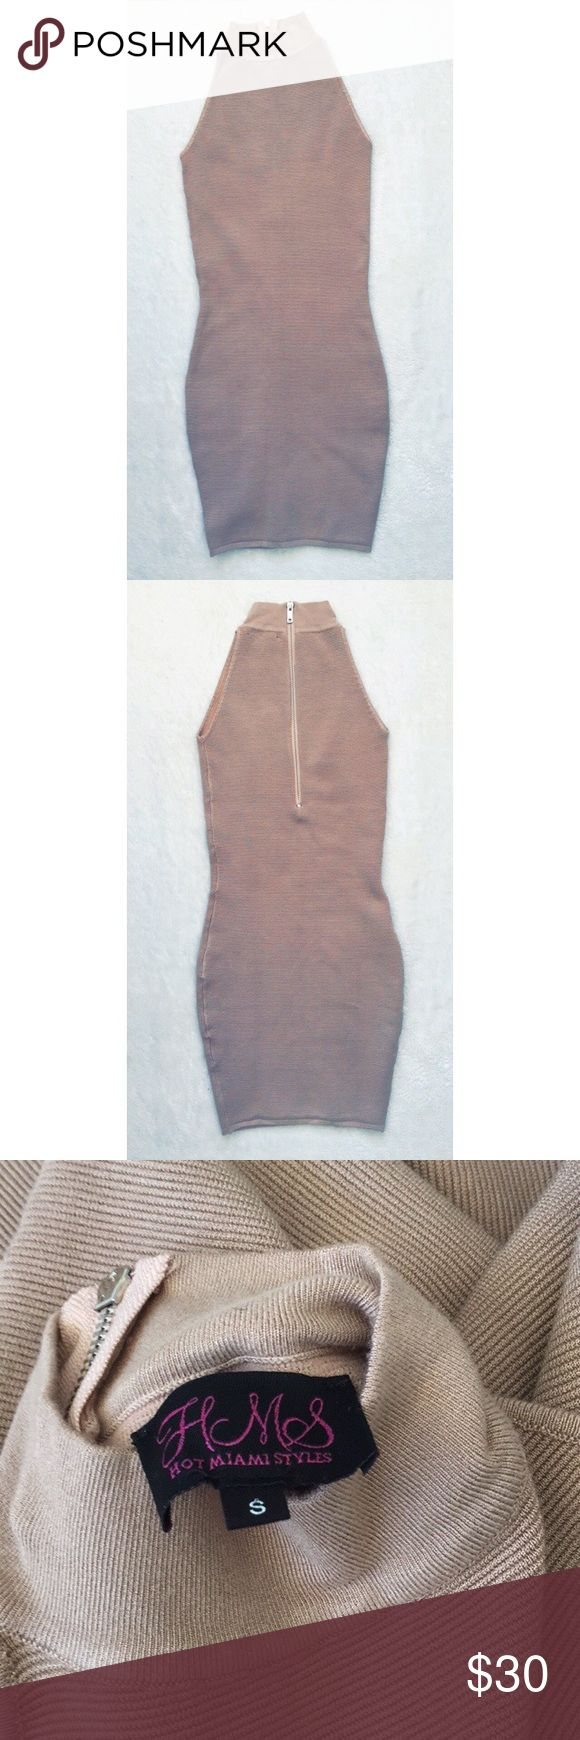 Nude mini dress Nude mini dress-Brand new, never worn. Turtle neck , Back zipper, stretchy material. Hot Miami Styles Dresses Mini